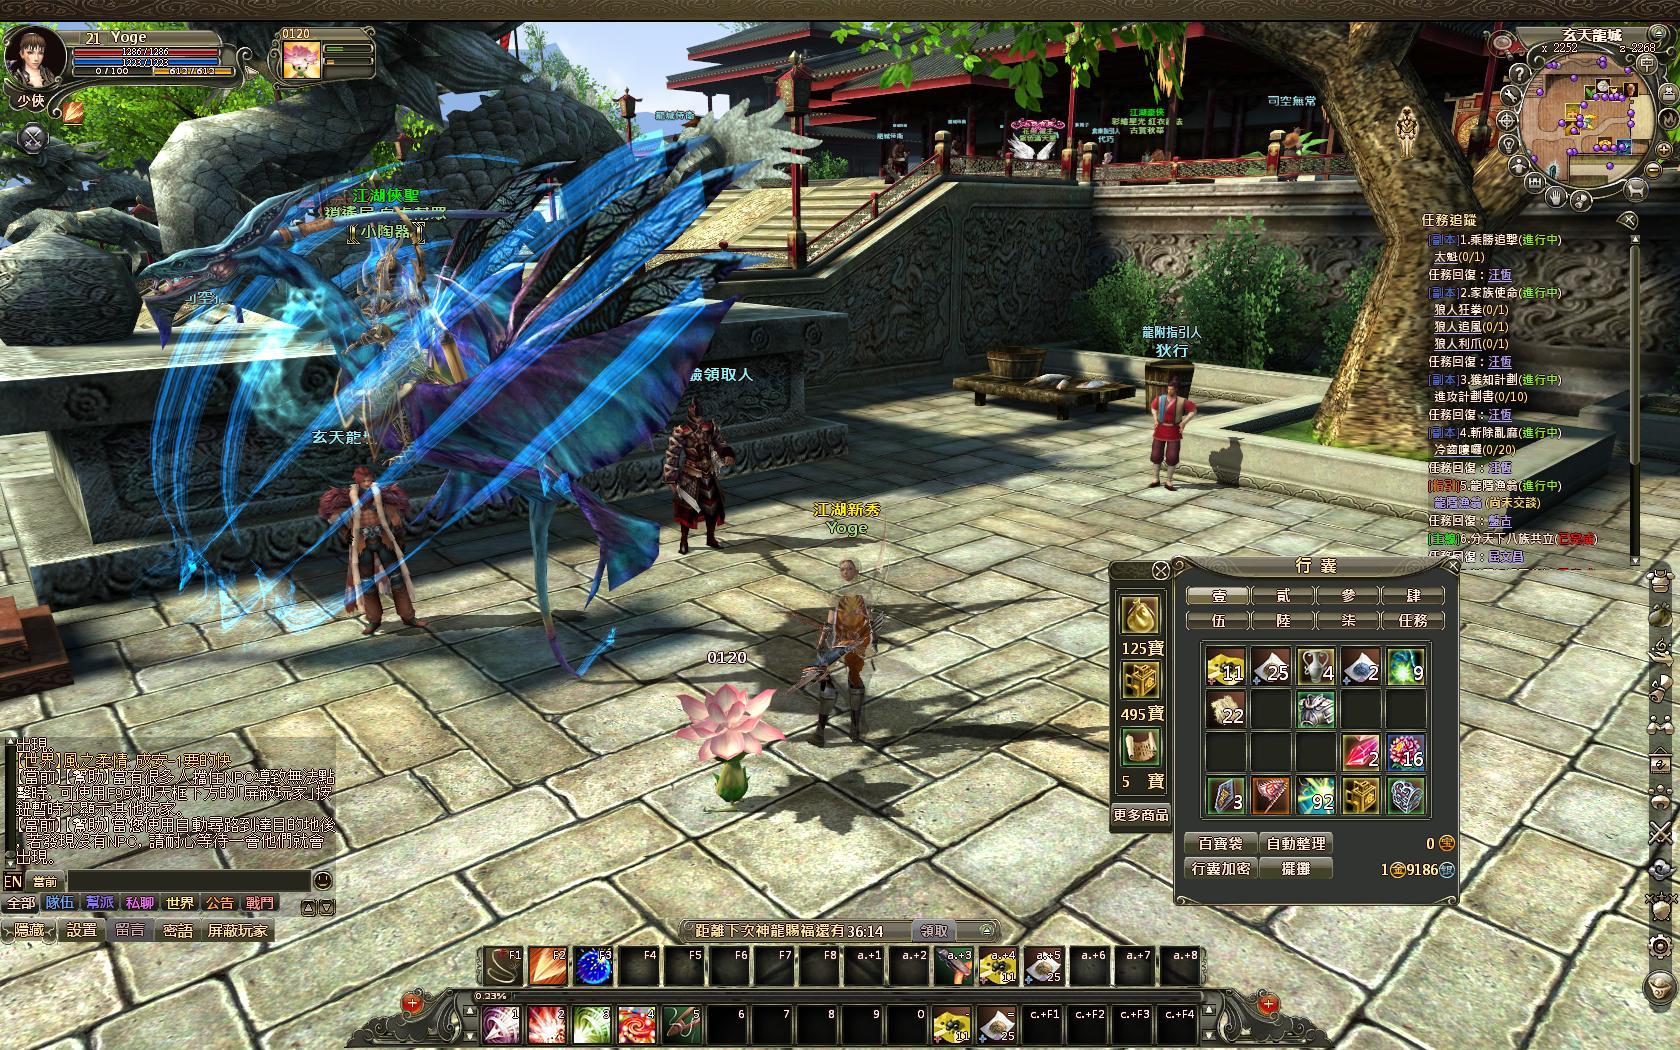 LoongScreenshot[10-8-2010 110554]-8550153